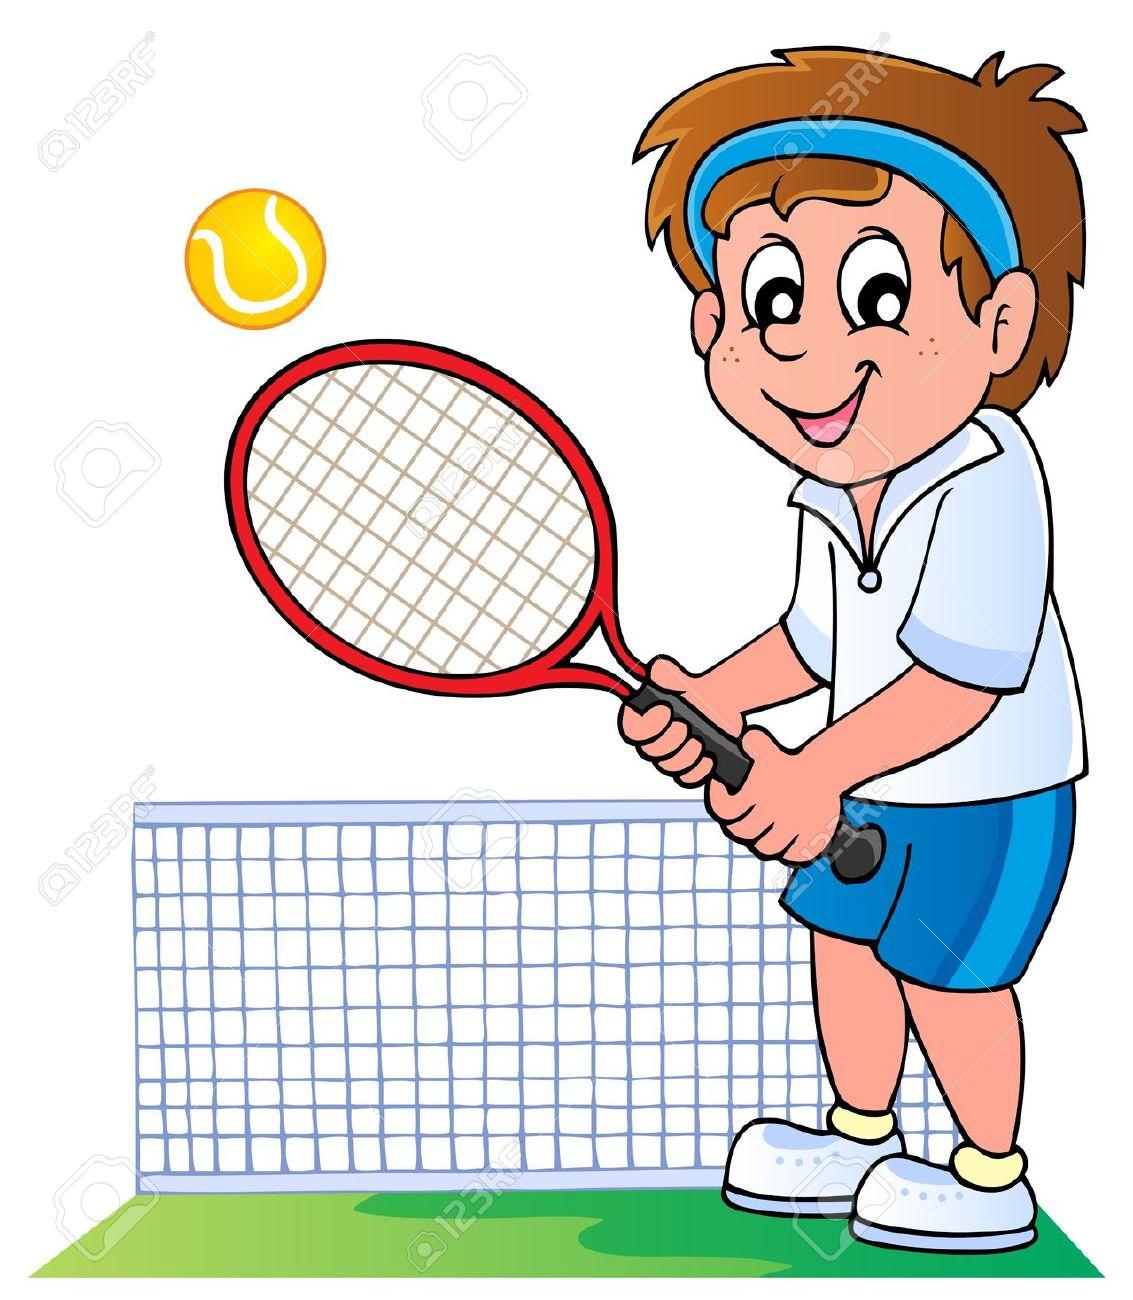 Cartoon Tennis Player.